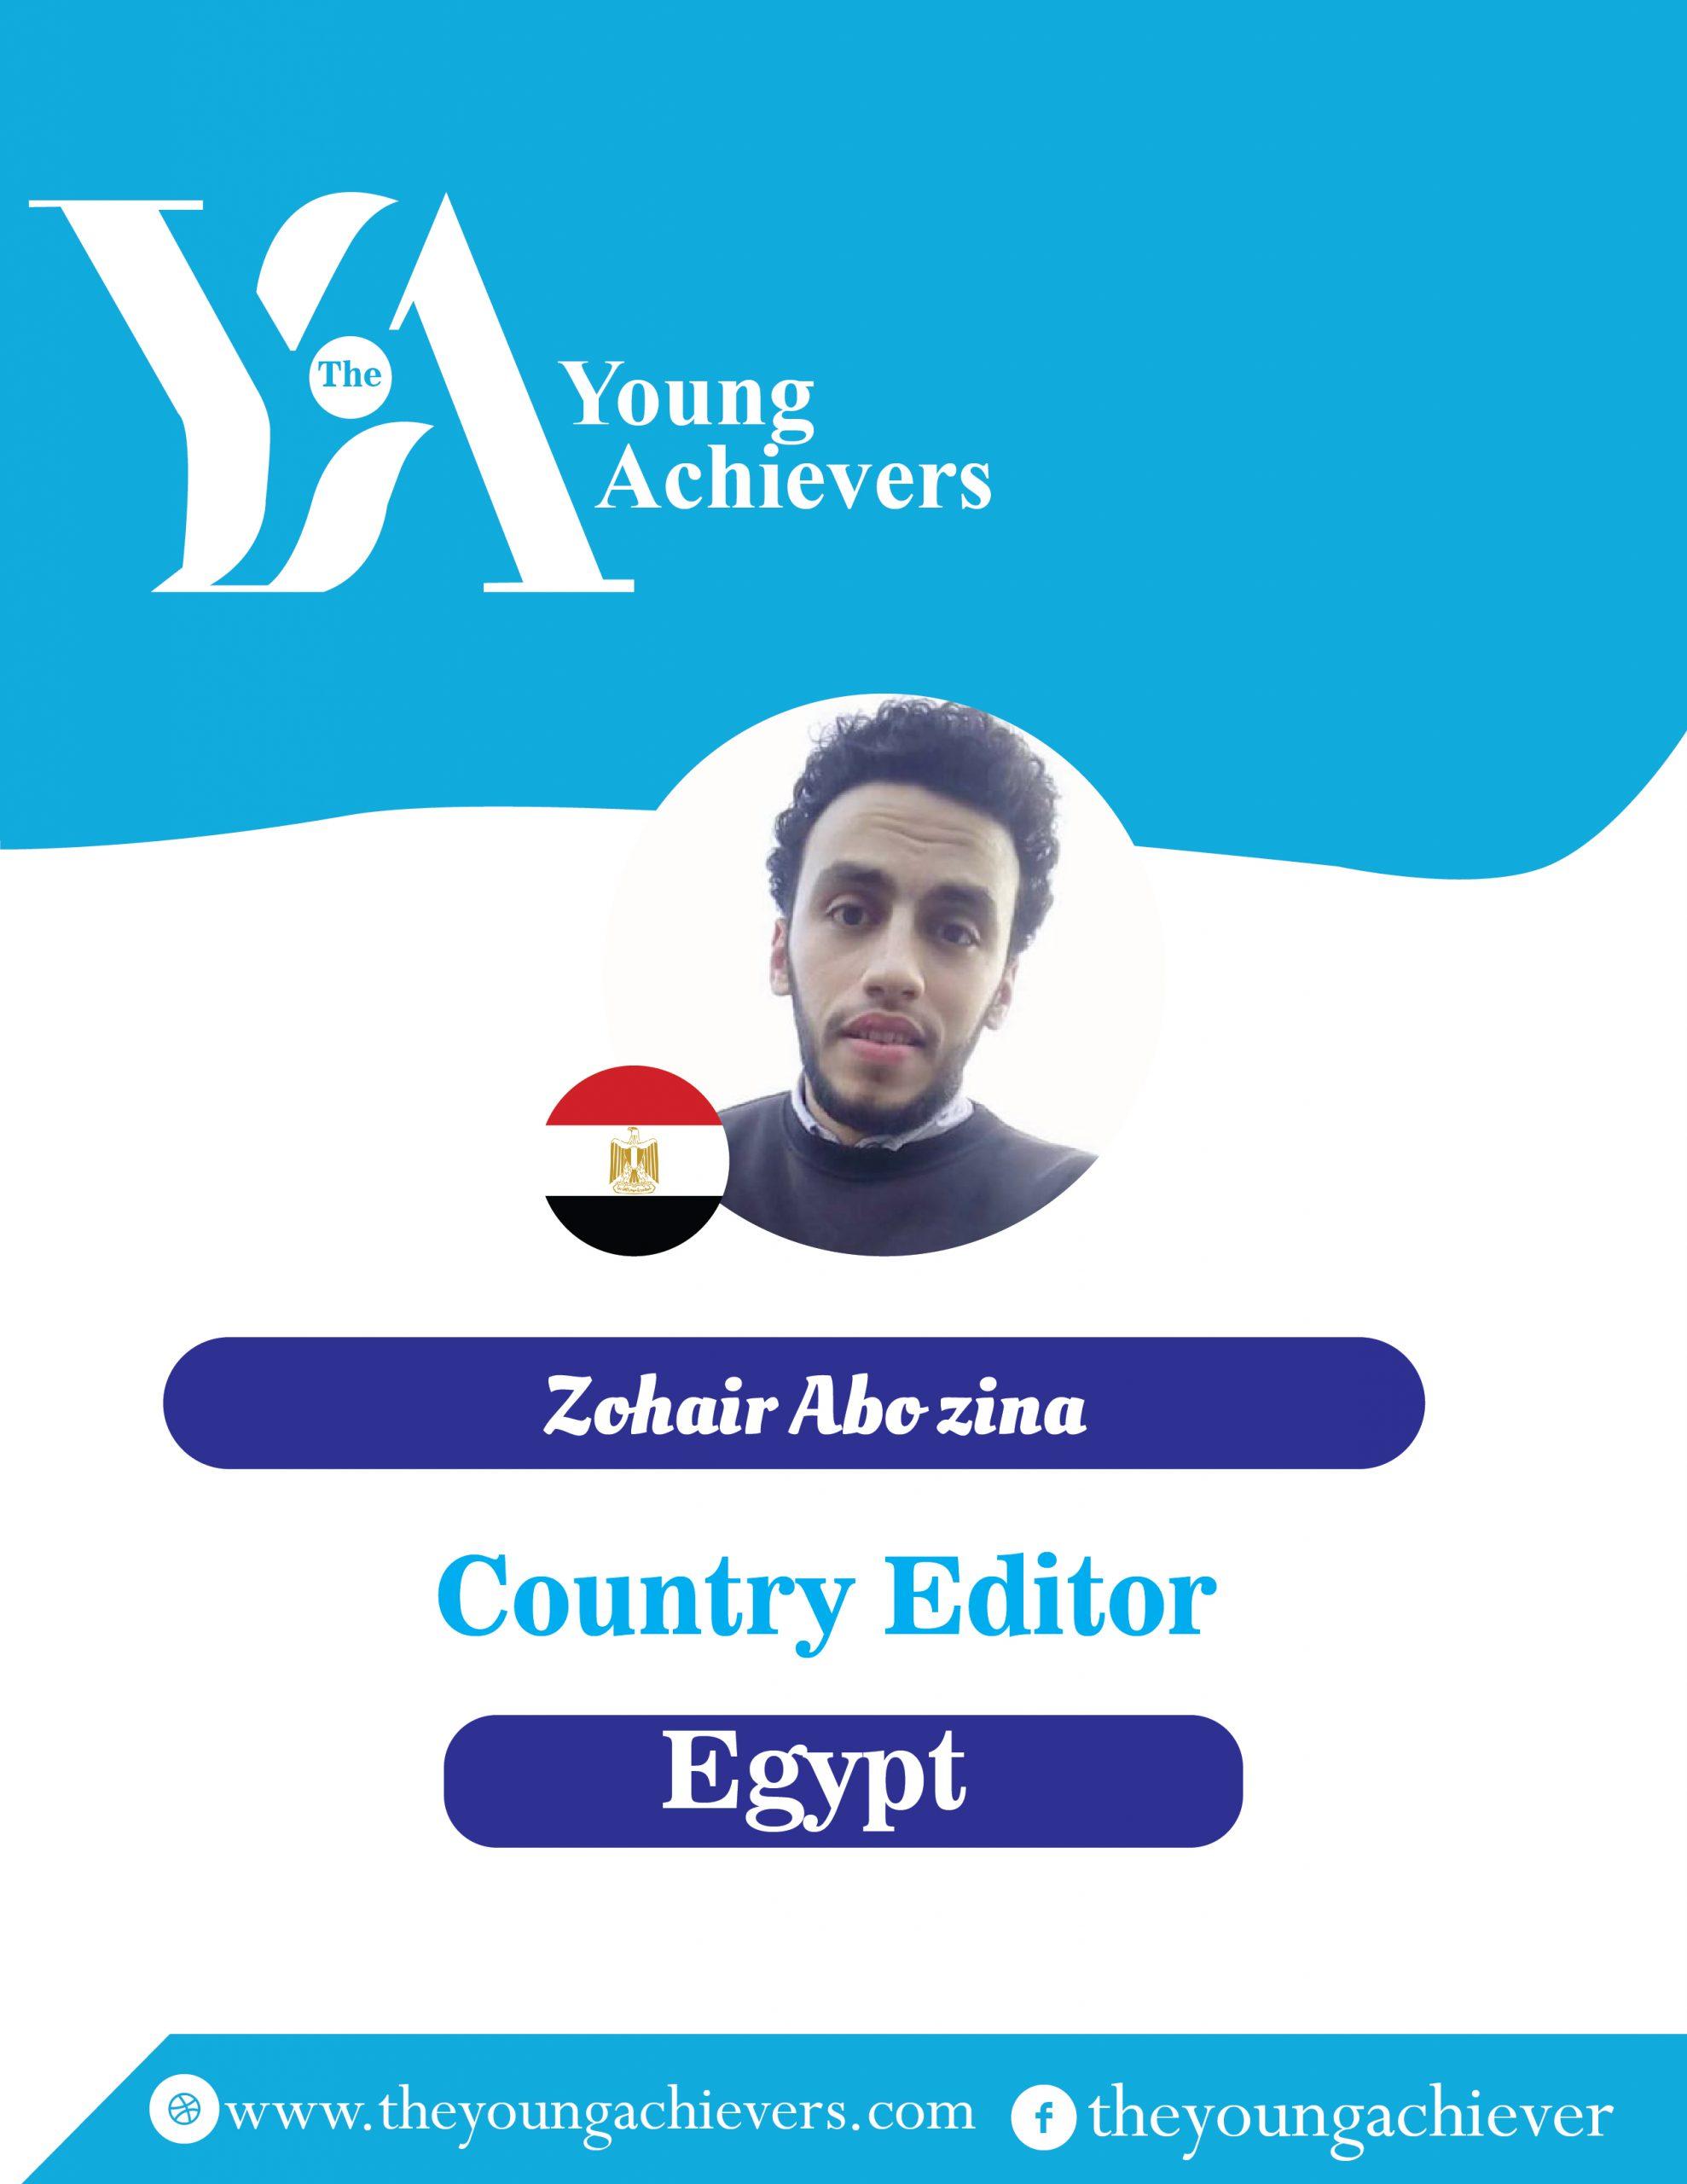 Zohair Abo zina